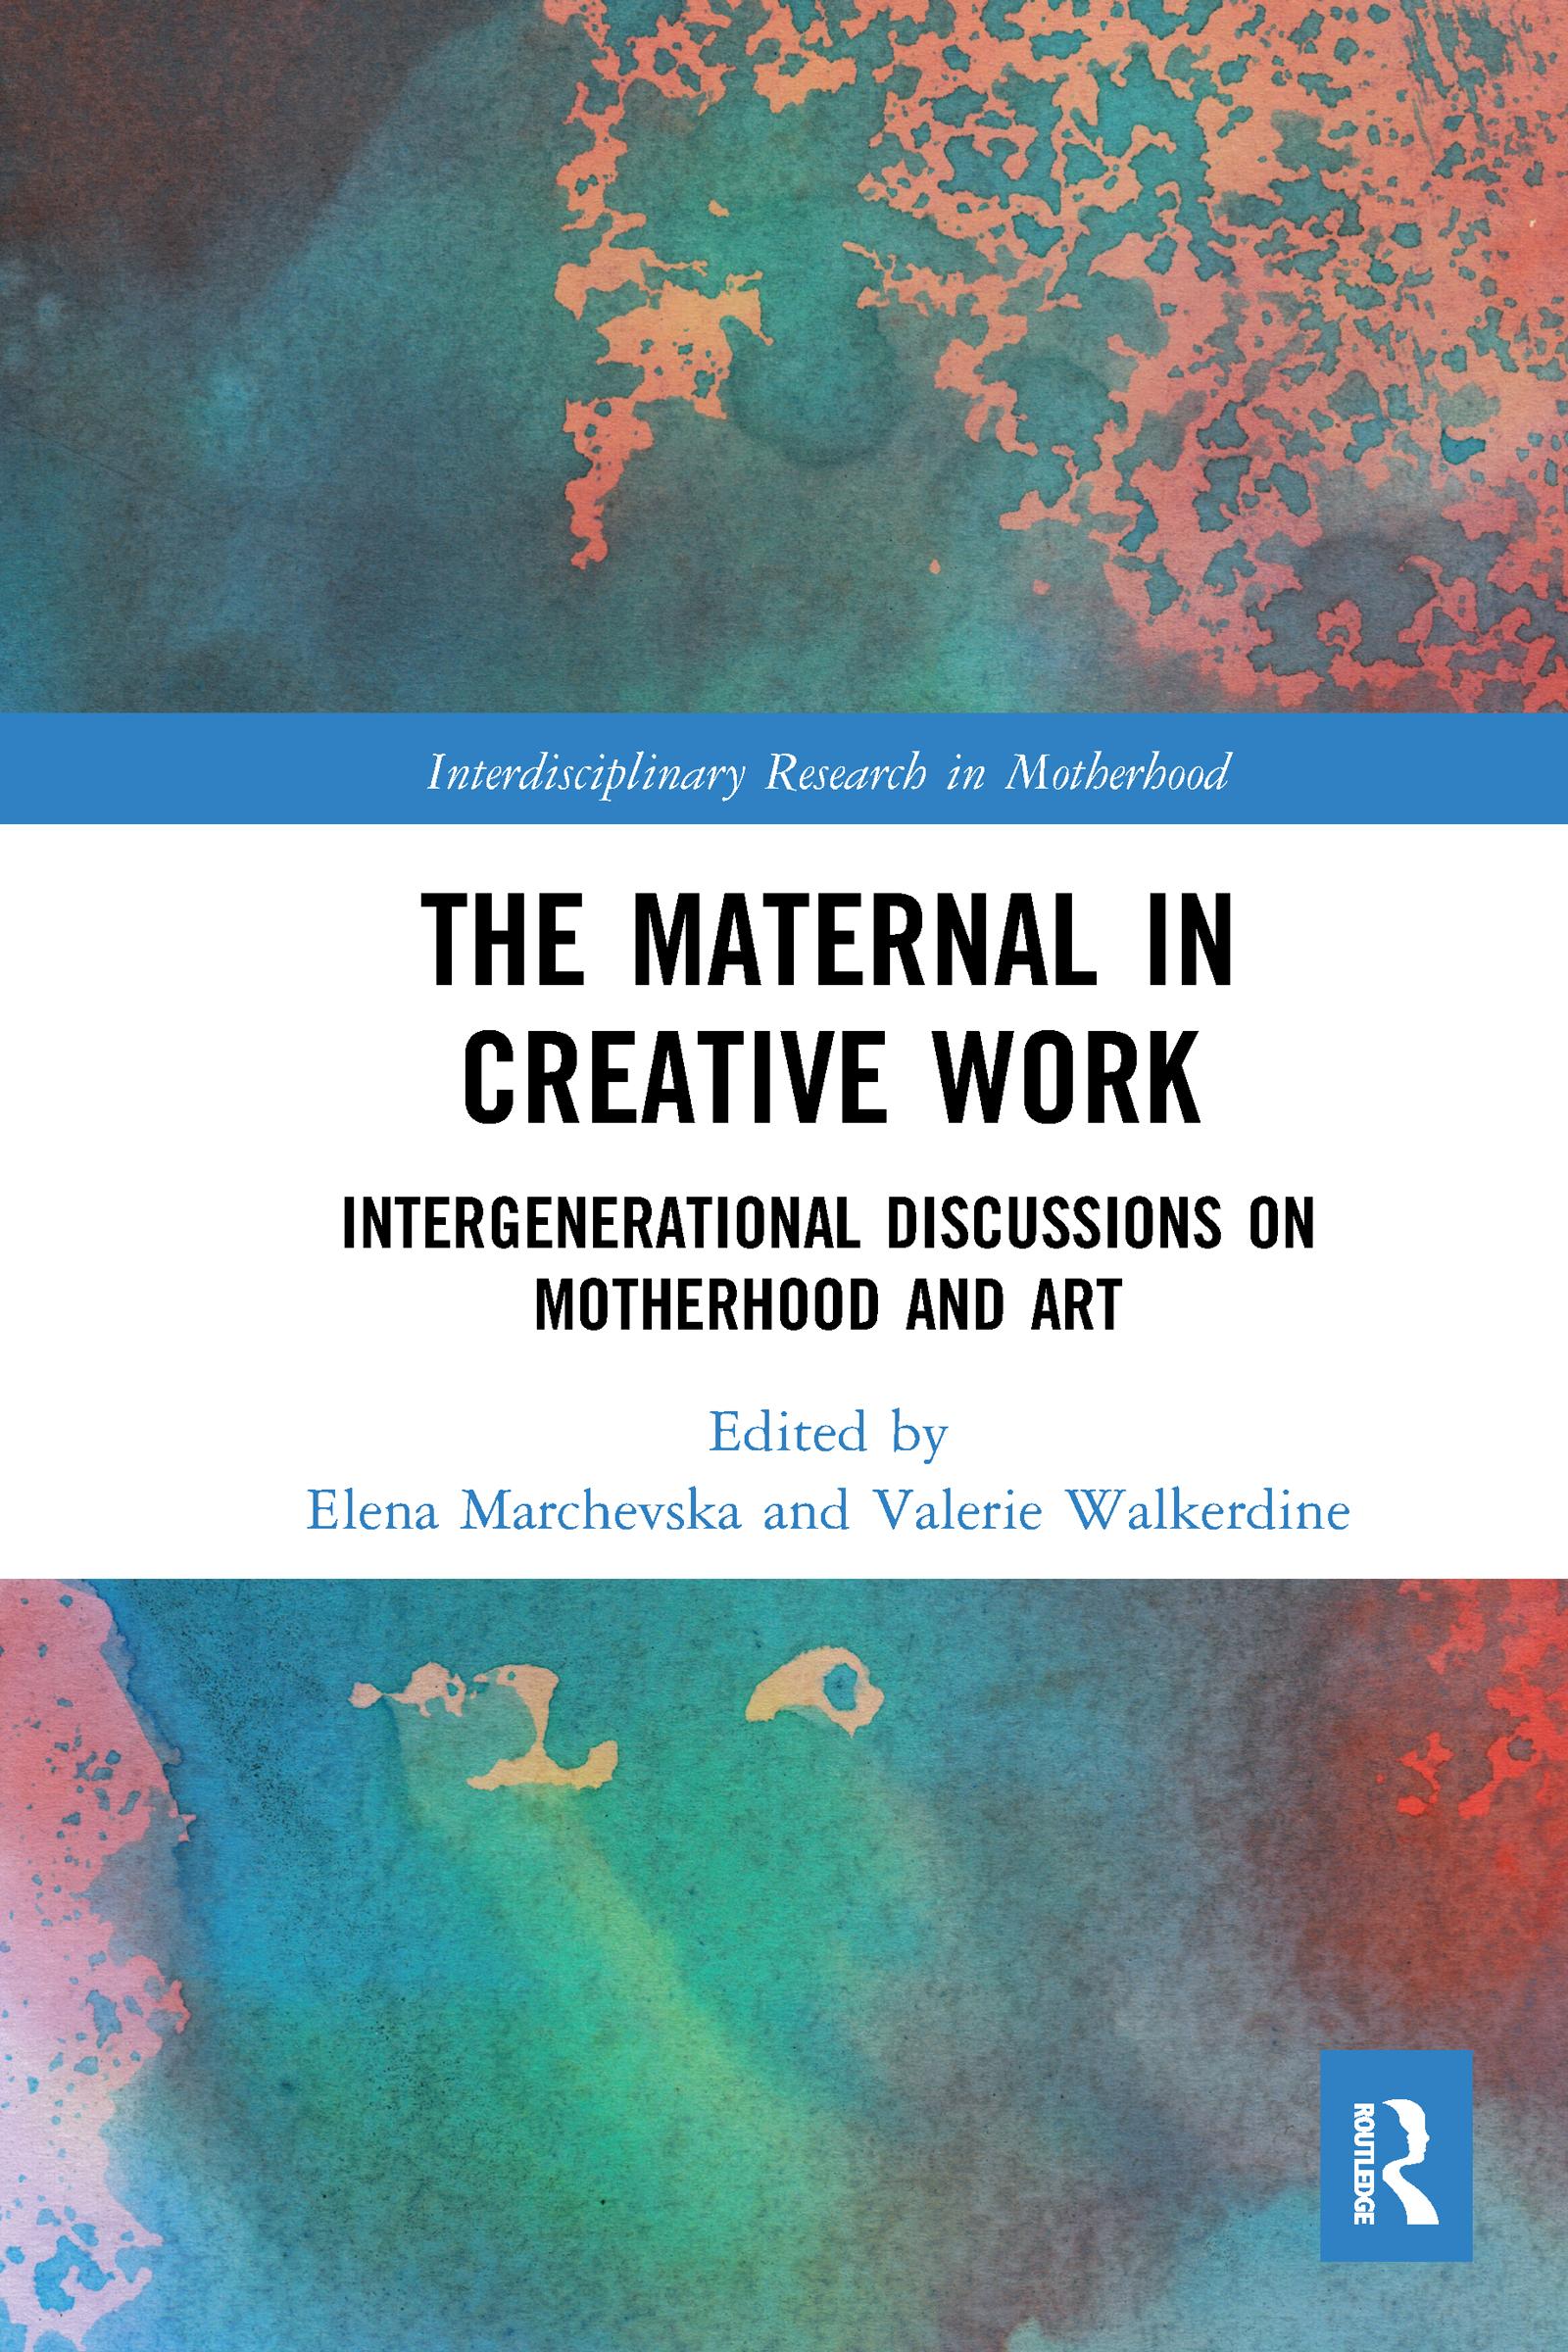 The Maternal in Creative Work